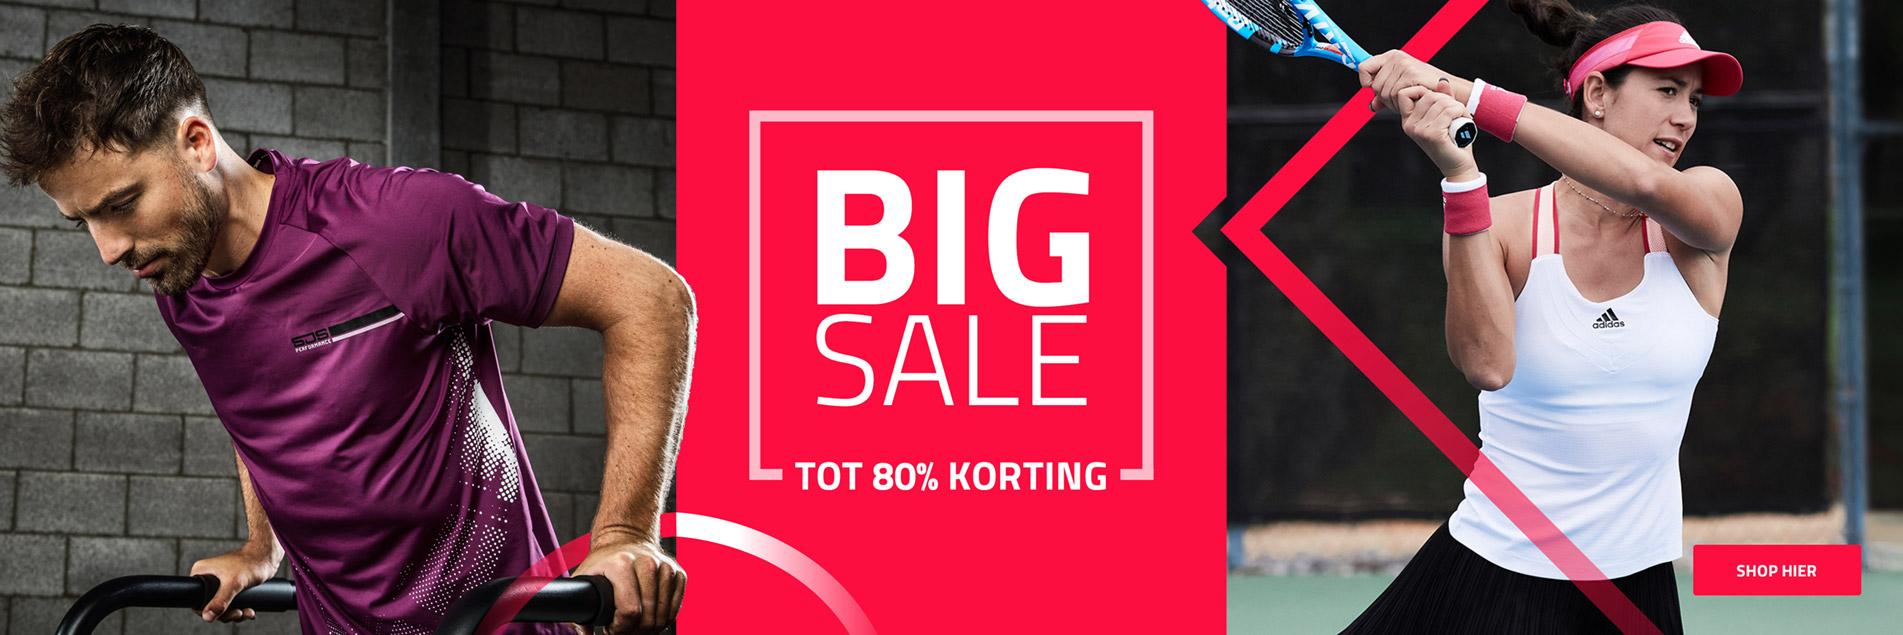 Big Sale | Tot 80% korting!